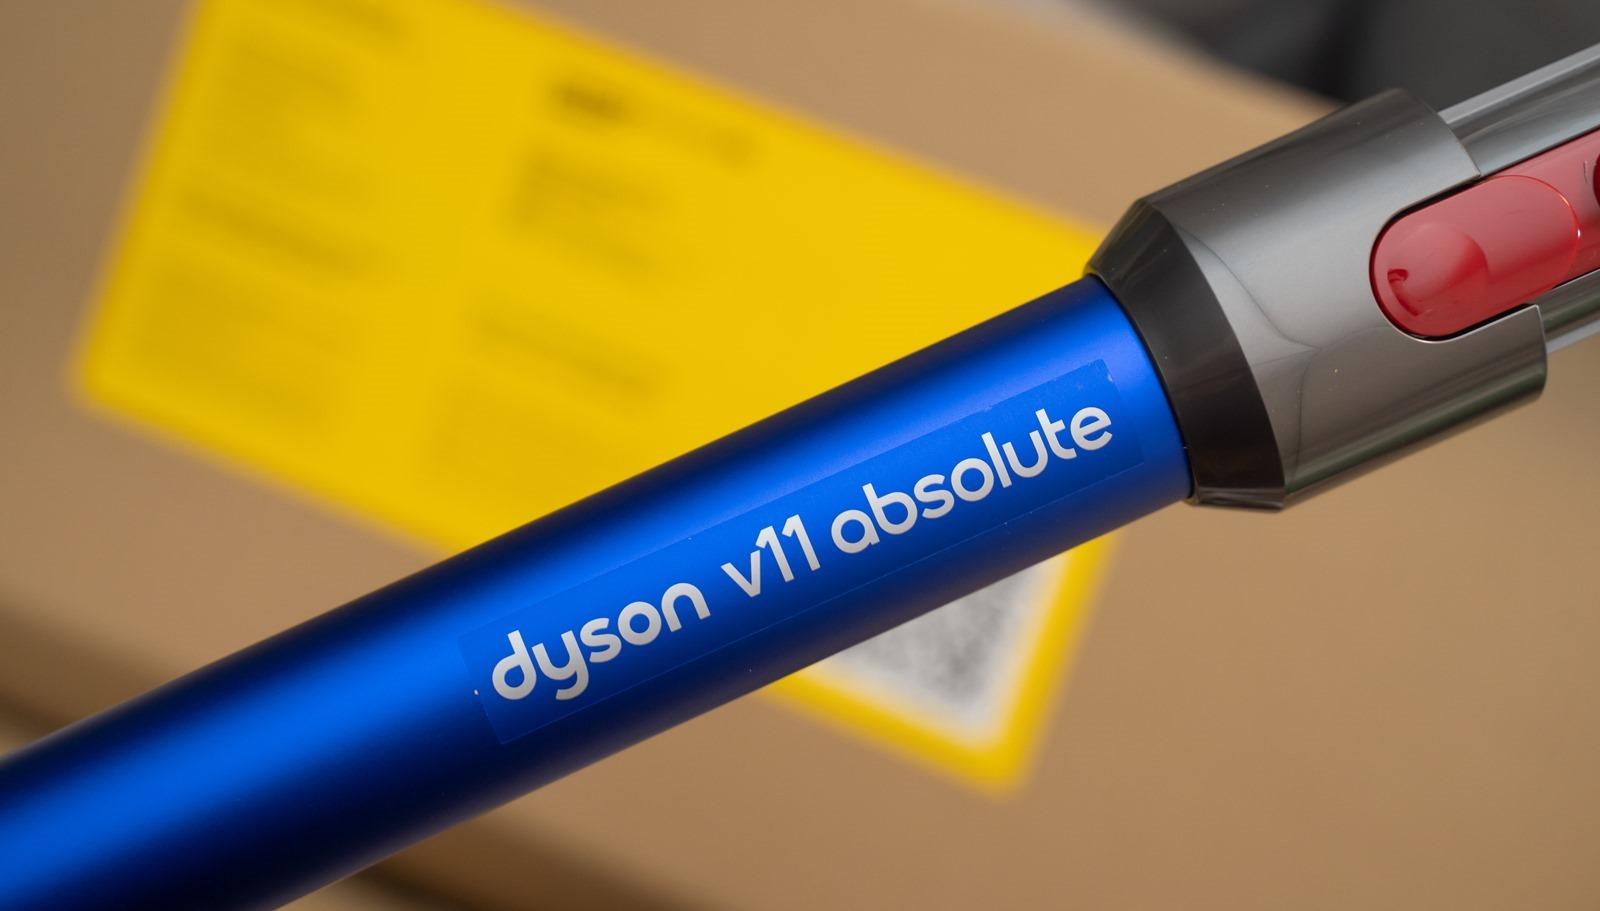 Dyson V11 再次自我超越!乾淨、強效、潔淨、電力強,且不同材質地面不用再手動調整模式,吸力增強 20%、一小時清掃不間斷 @3C 達人廖阿輝